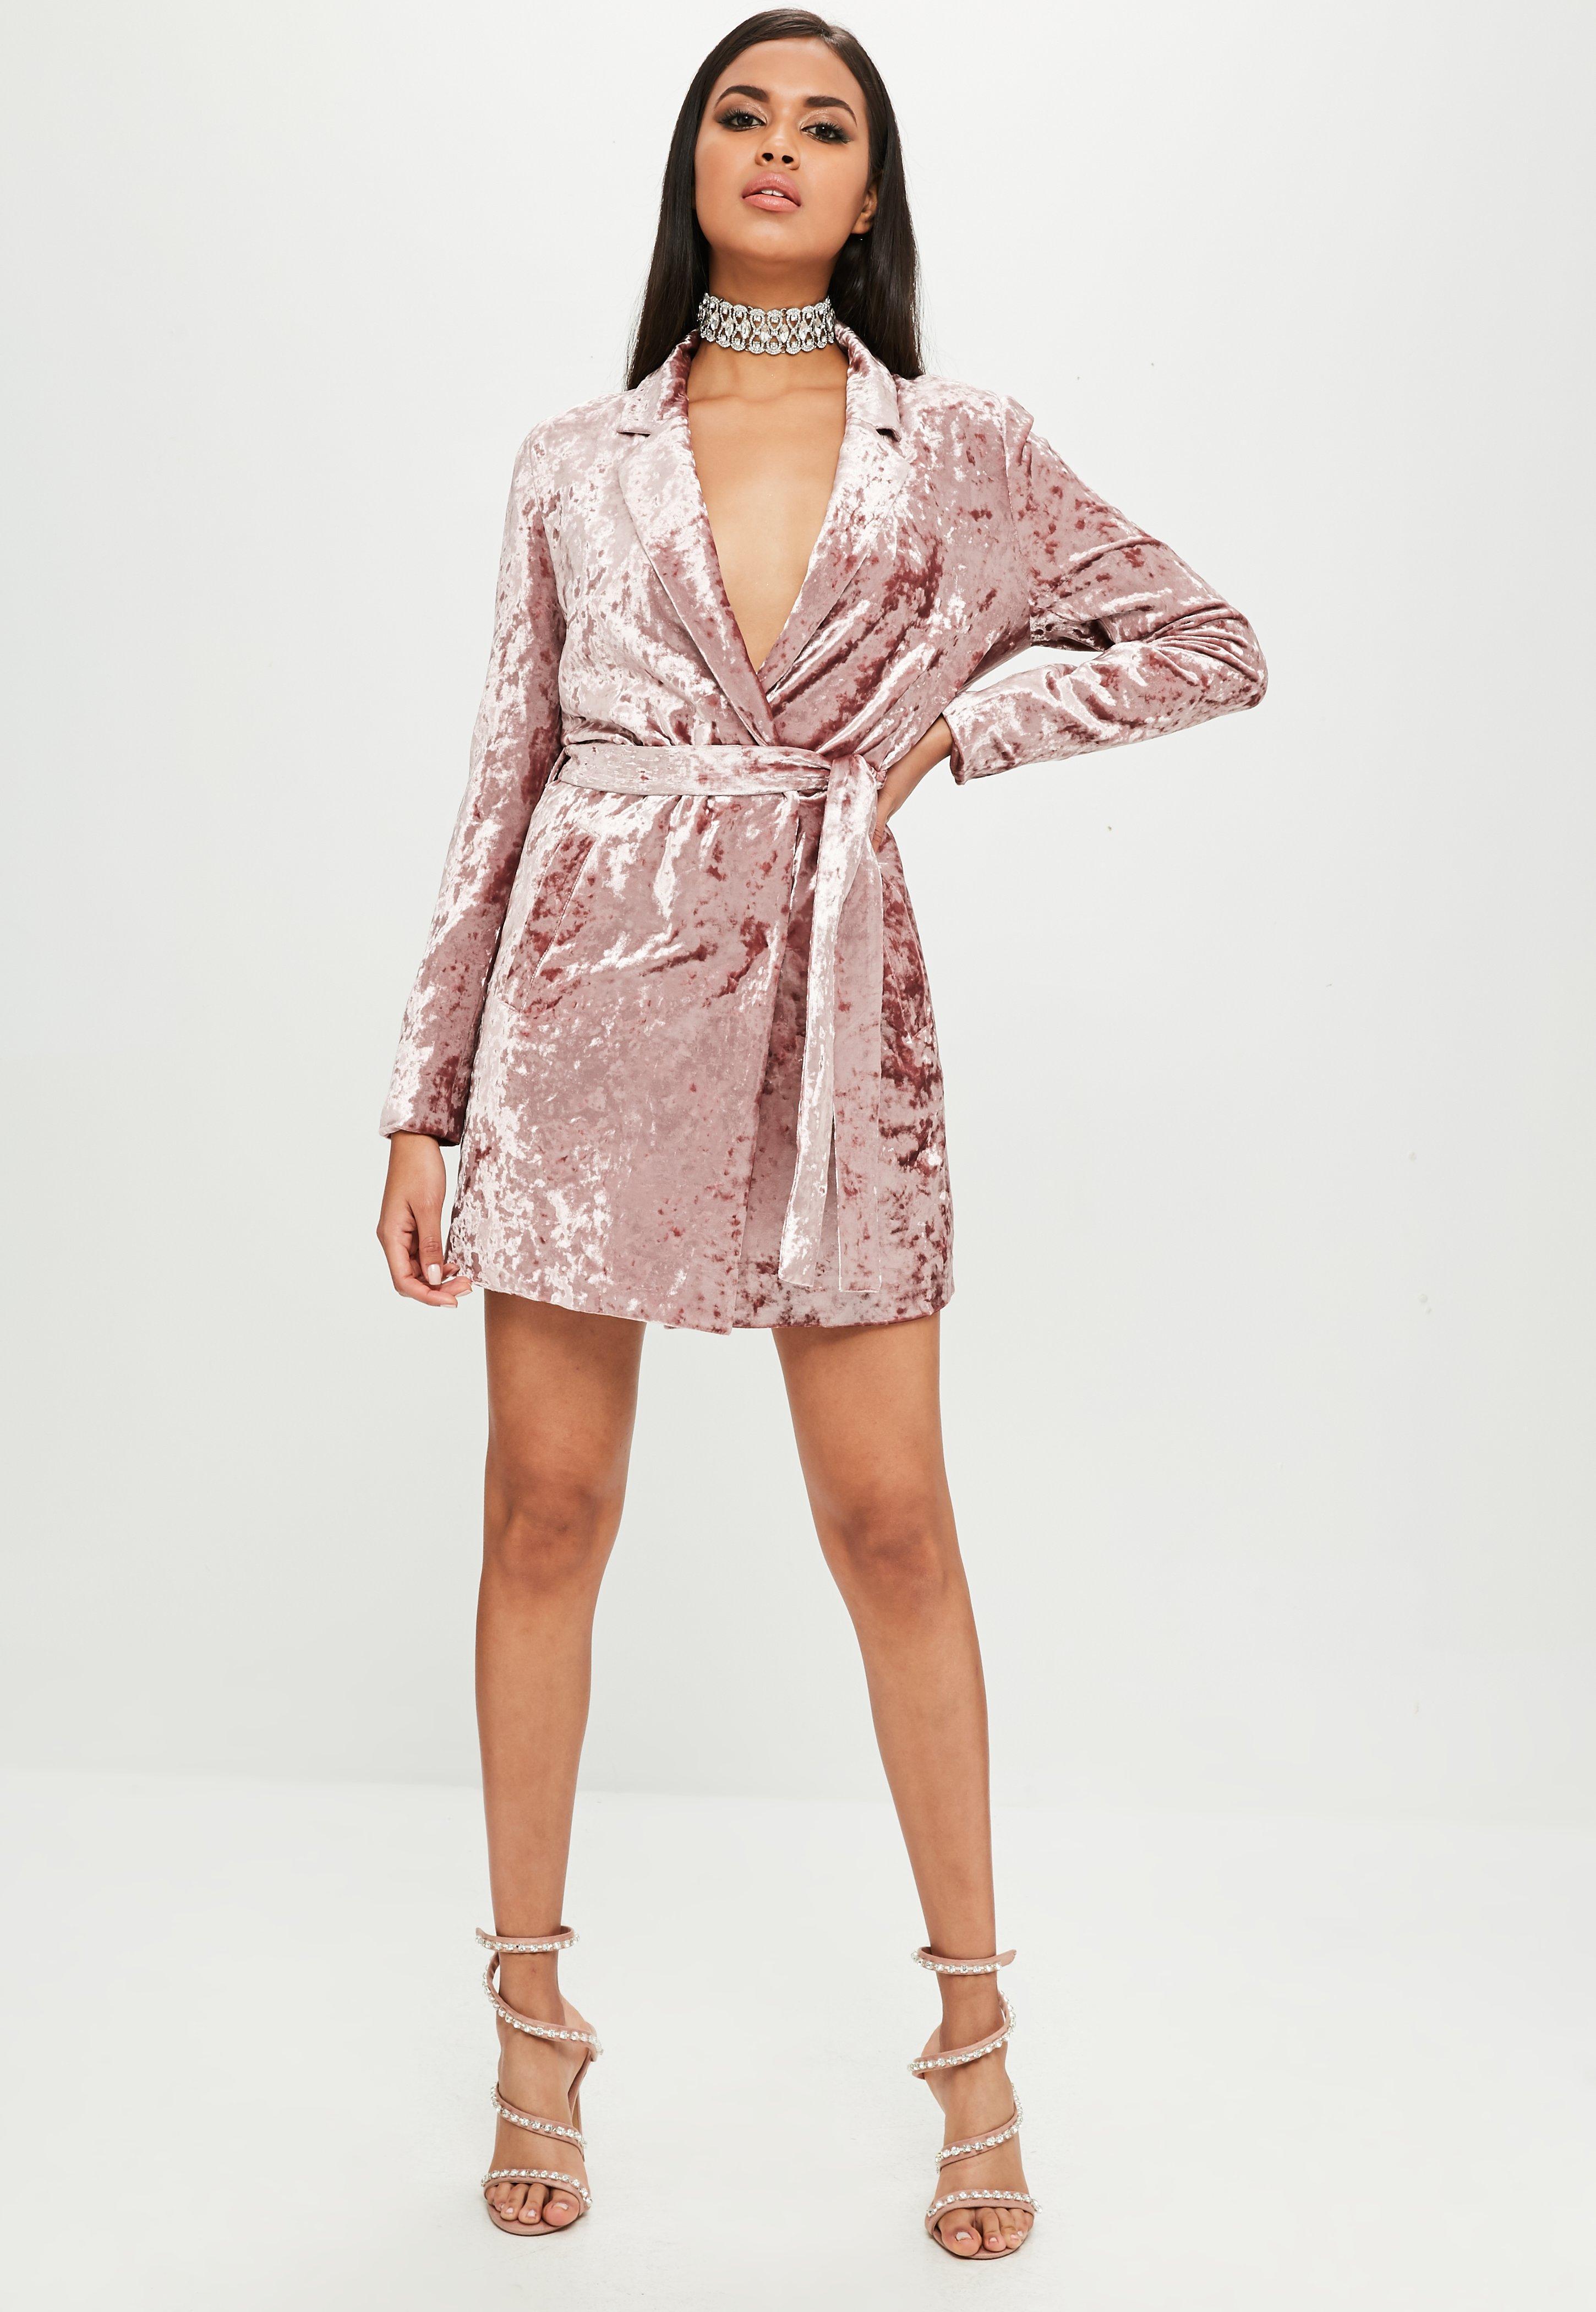 0e46149b6eea Missguided - Carli Bybel X Pink Crushed Velvet Wrap Dress - Lyst. View  fullscreen